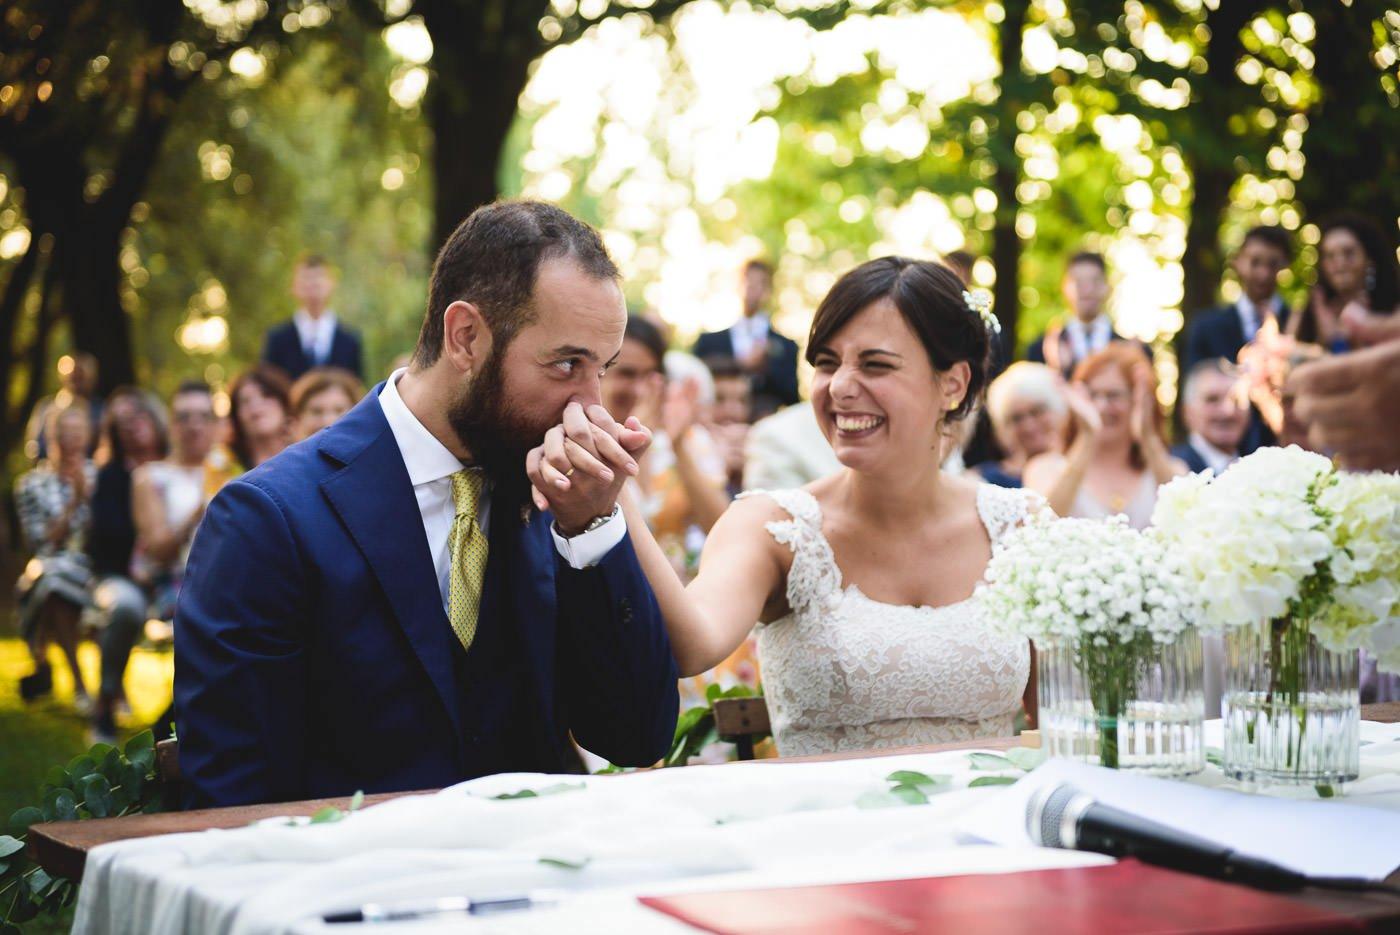 Matrimonio Giulia & Federico 09_15 – Alessio Nobili Photographer-33